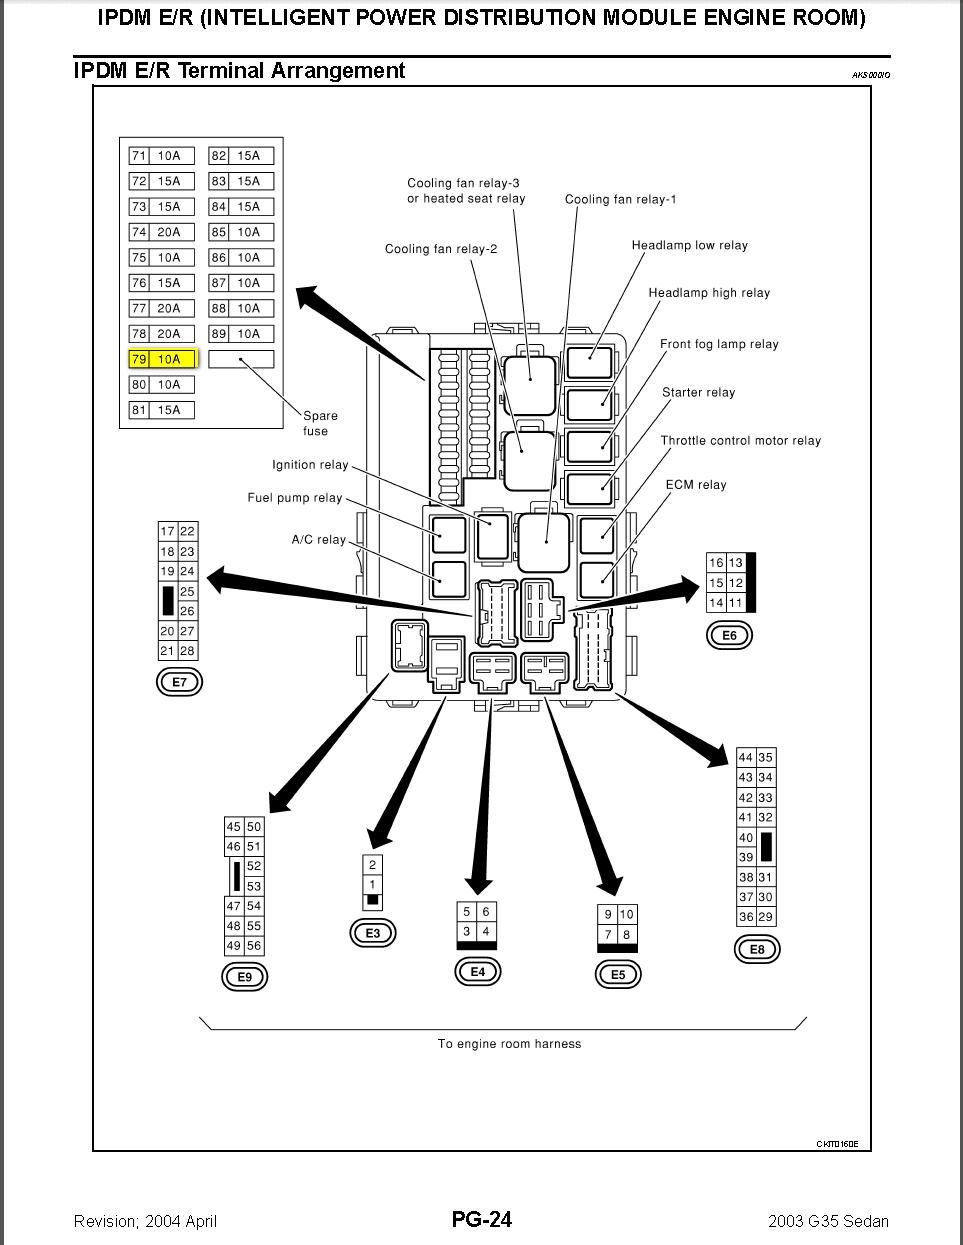 2003 G35 Coupe Fuse Box Wiring Diagram Productive Productive Zaafran It